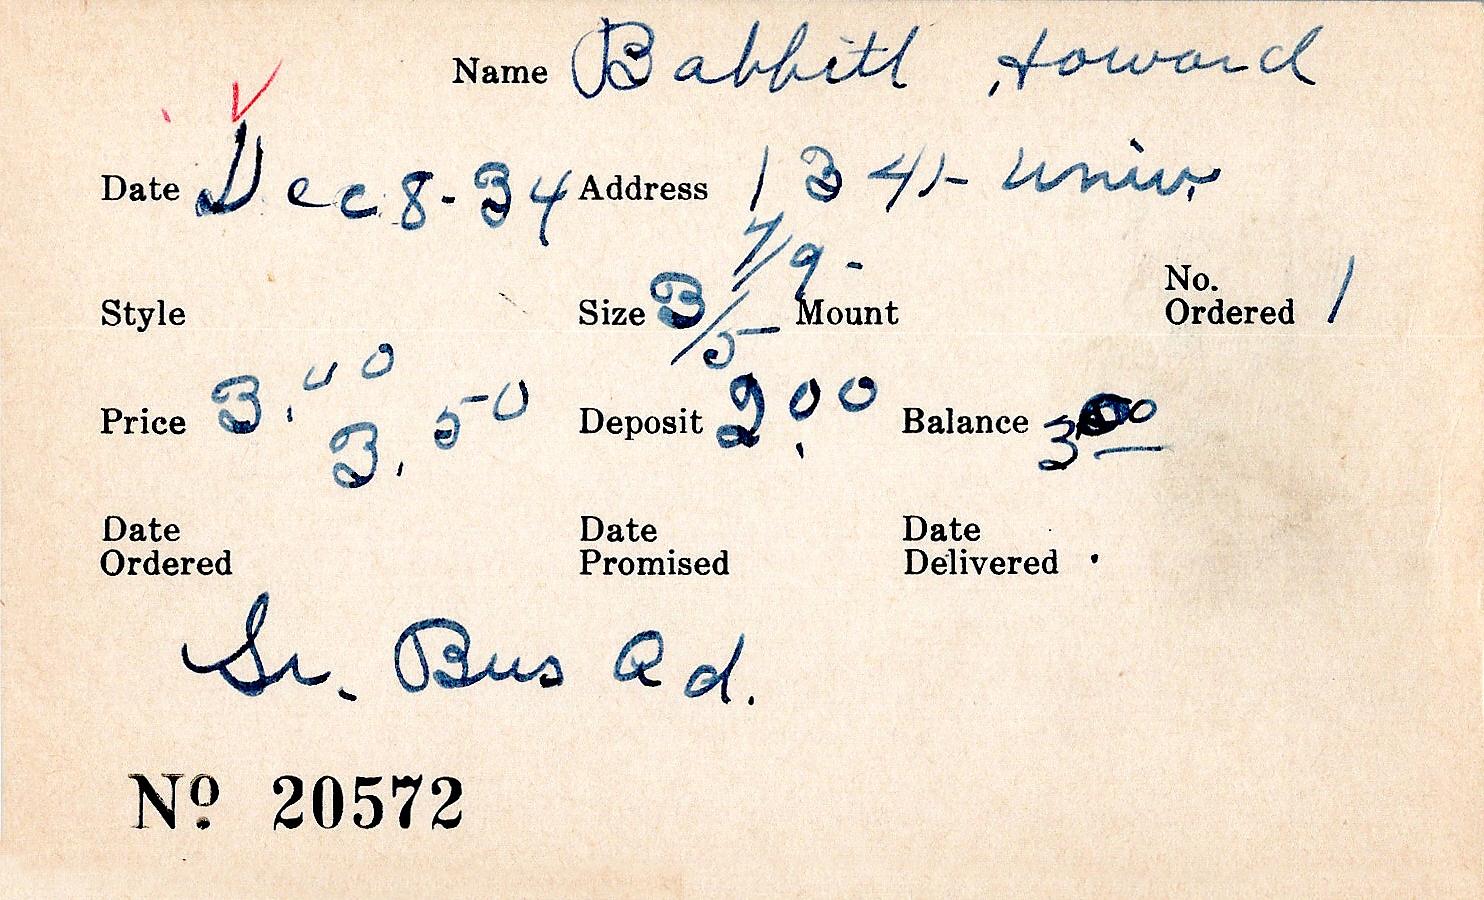 Index card for Howard Babbitt